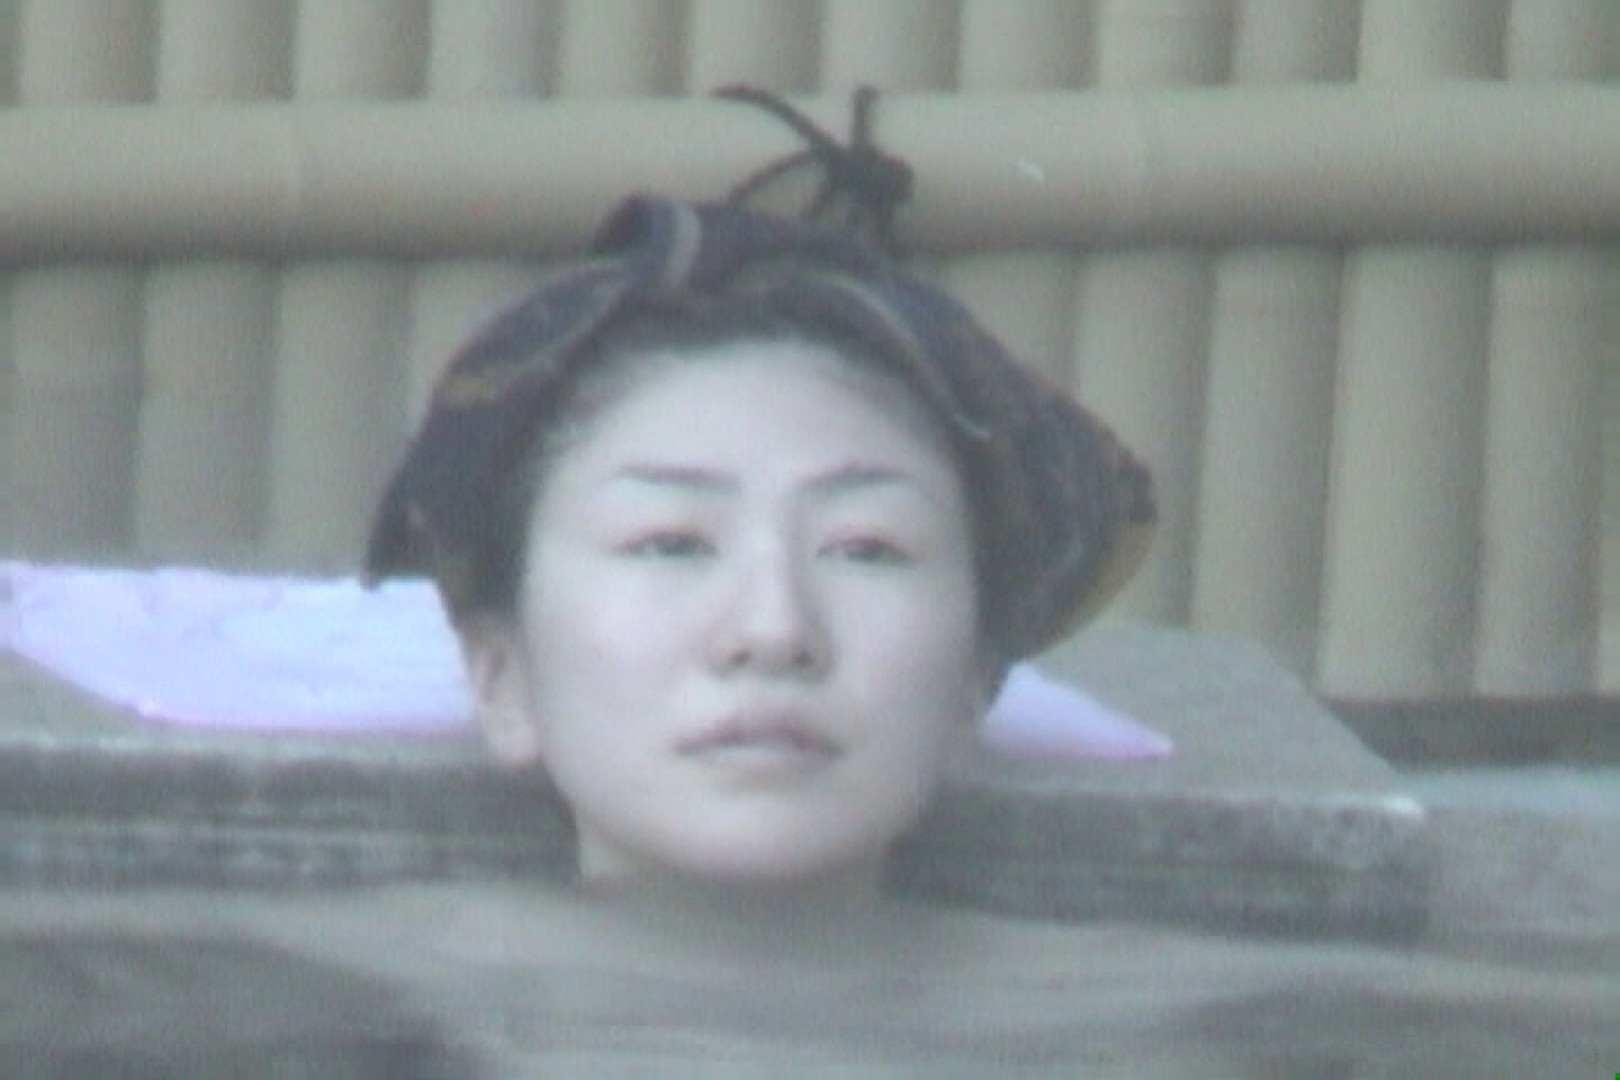 Aquaな露天風呂Vol.607 綺麗なOLたち アダルト動画キャプチャ 90枚 83